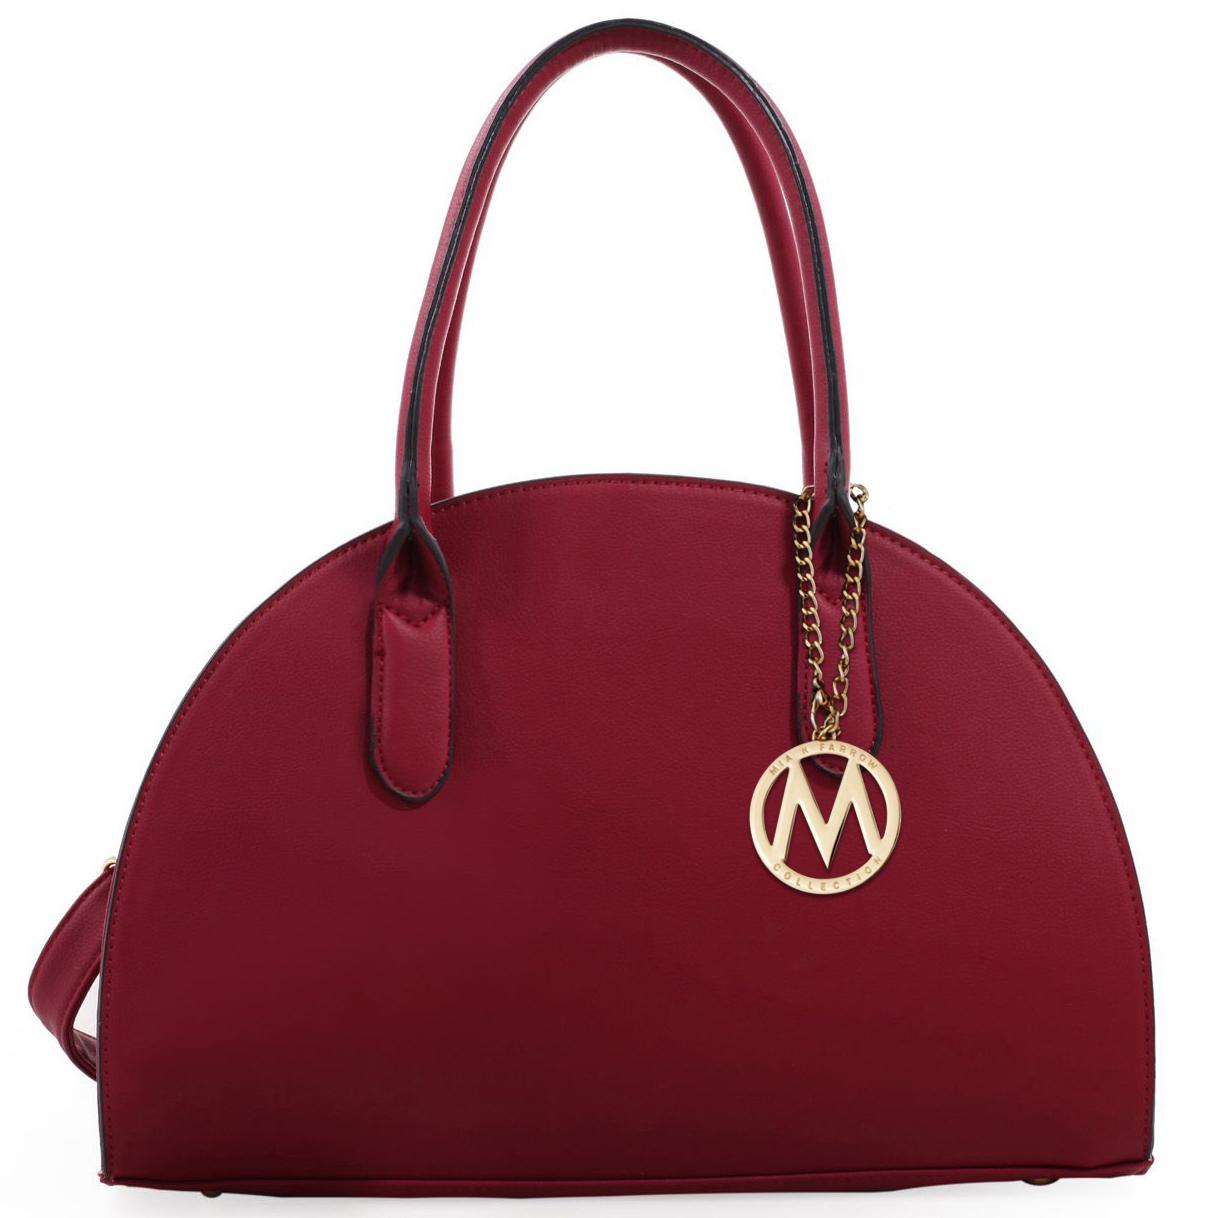 MKF Collection Half Moon Handbag by Mia K Farrow 3a0f5c35ed98